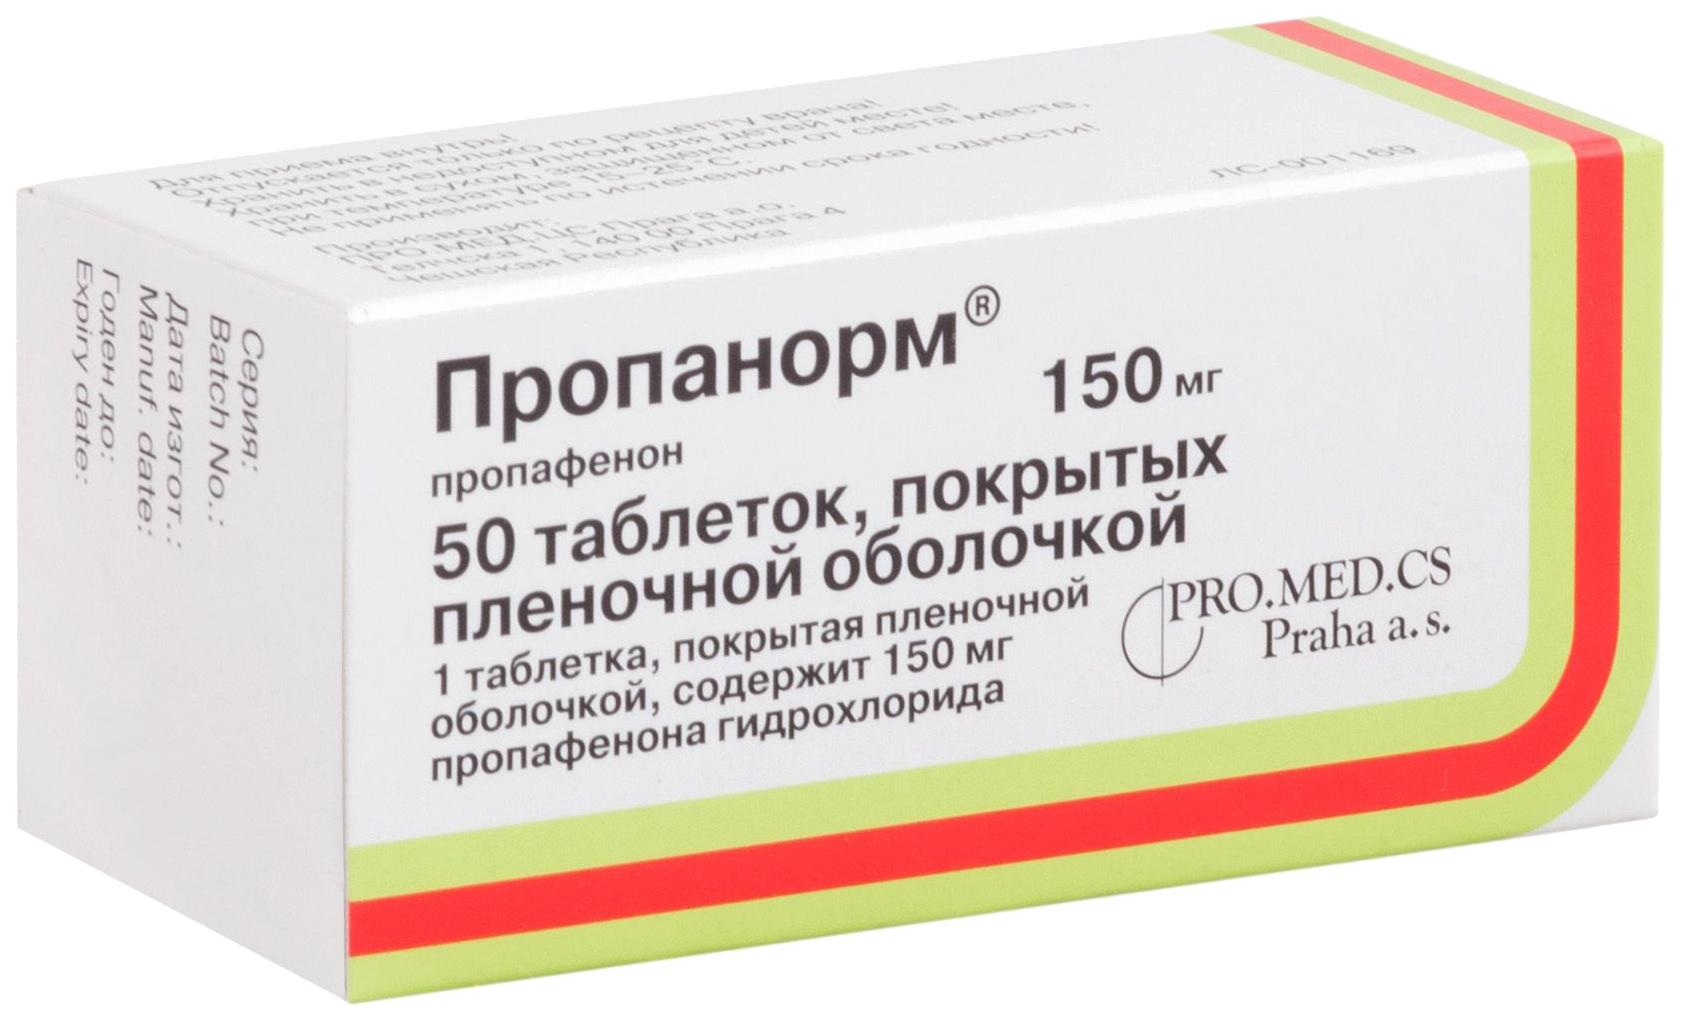 ПРОПАНОРМ таблетки 150 мг 50 шт.